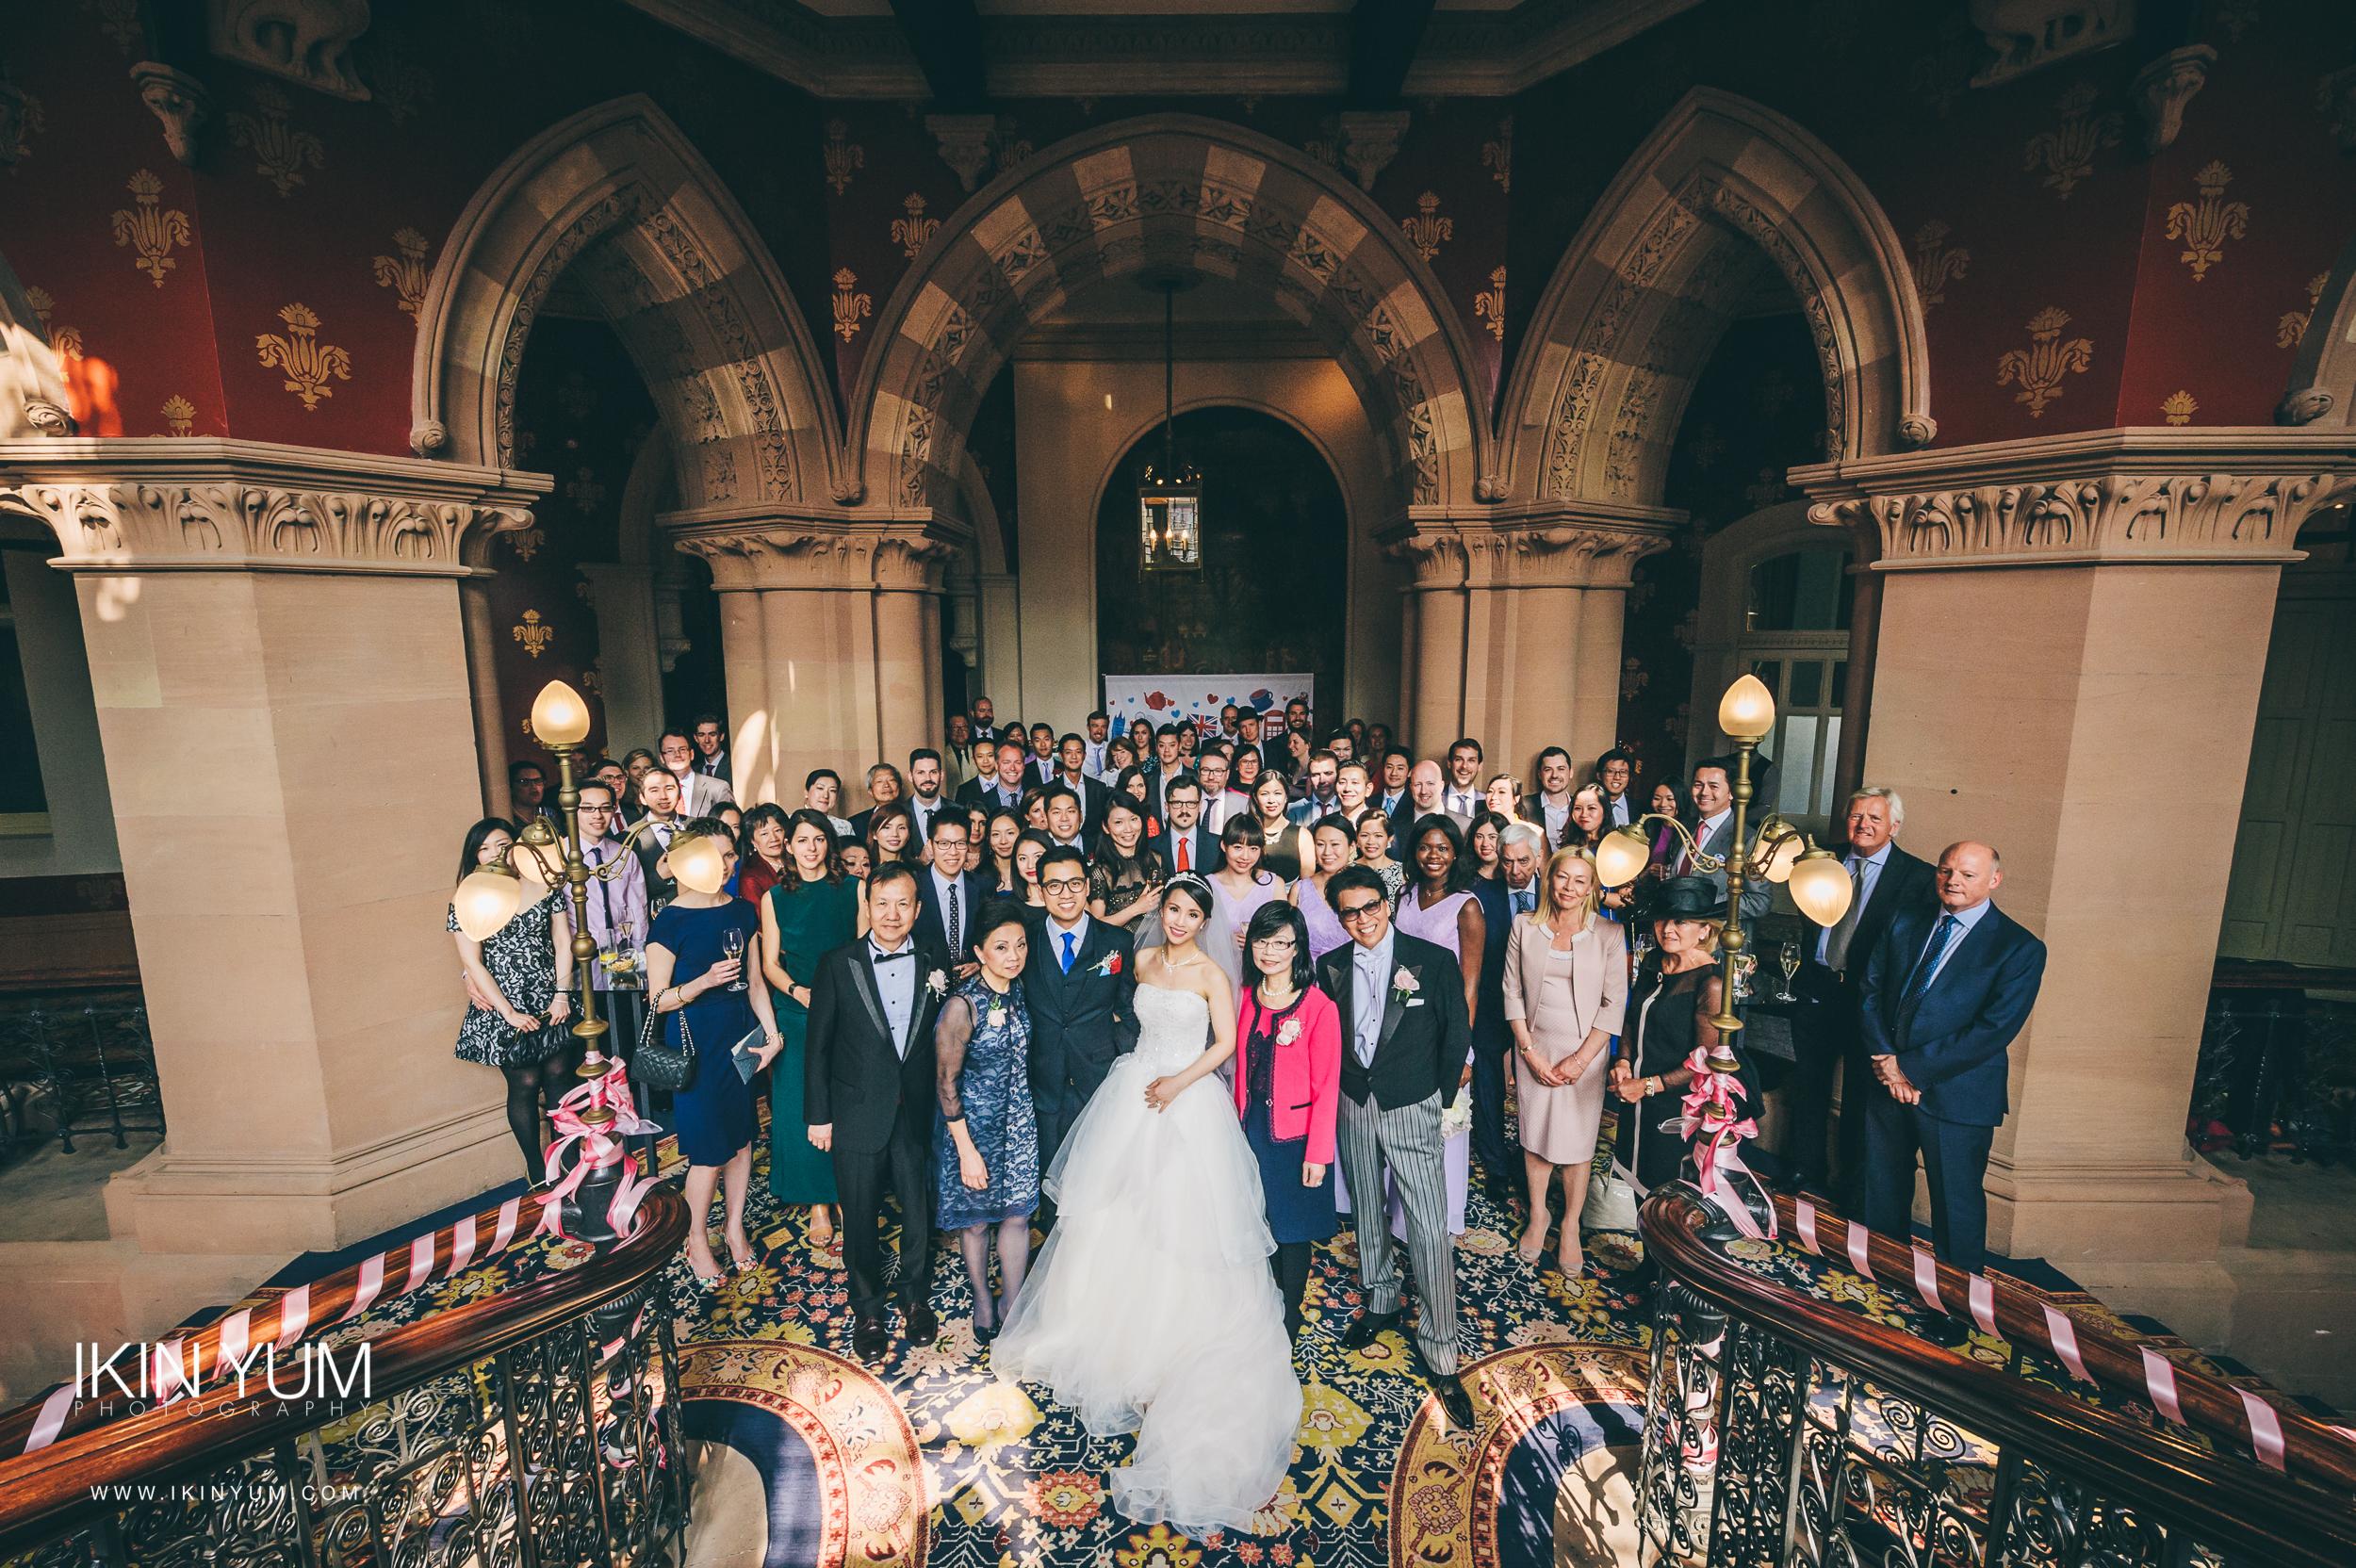 St Pancras Renaissance Hotel - Wedding - Ikin Yum Photography-112.jpg